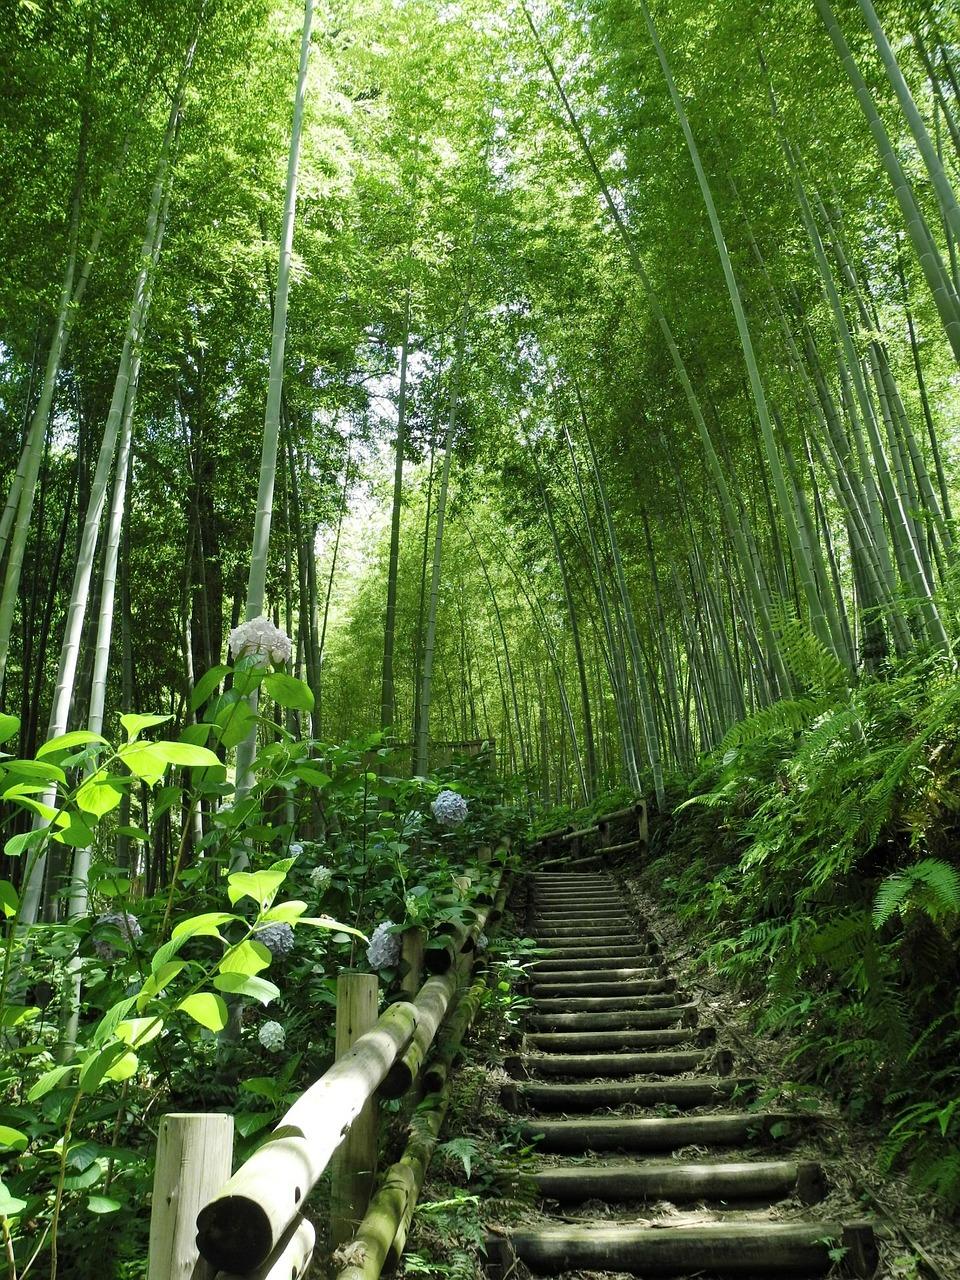 Bamboo forest, the bambu shop online